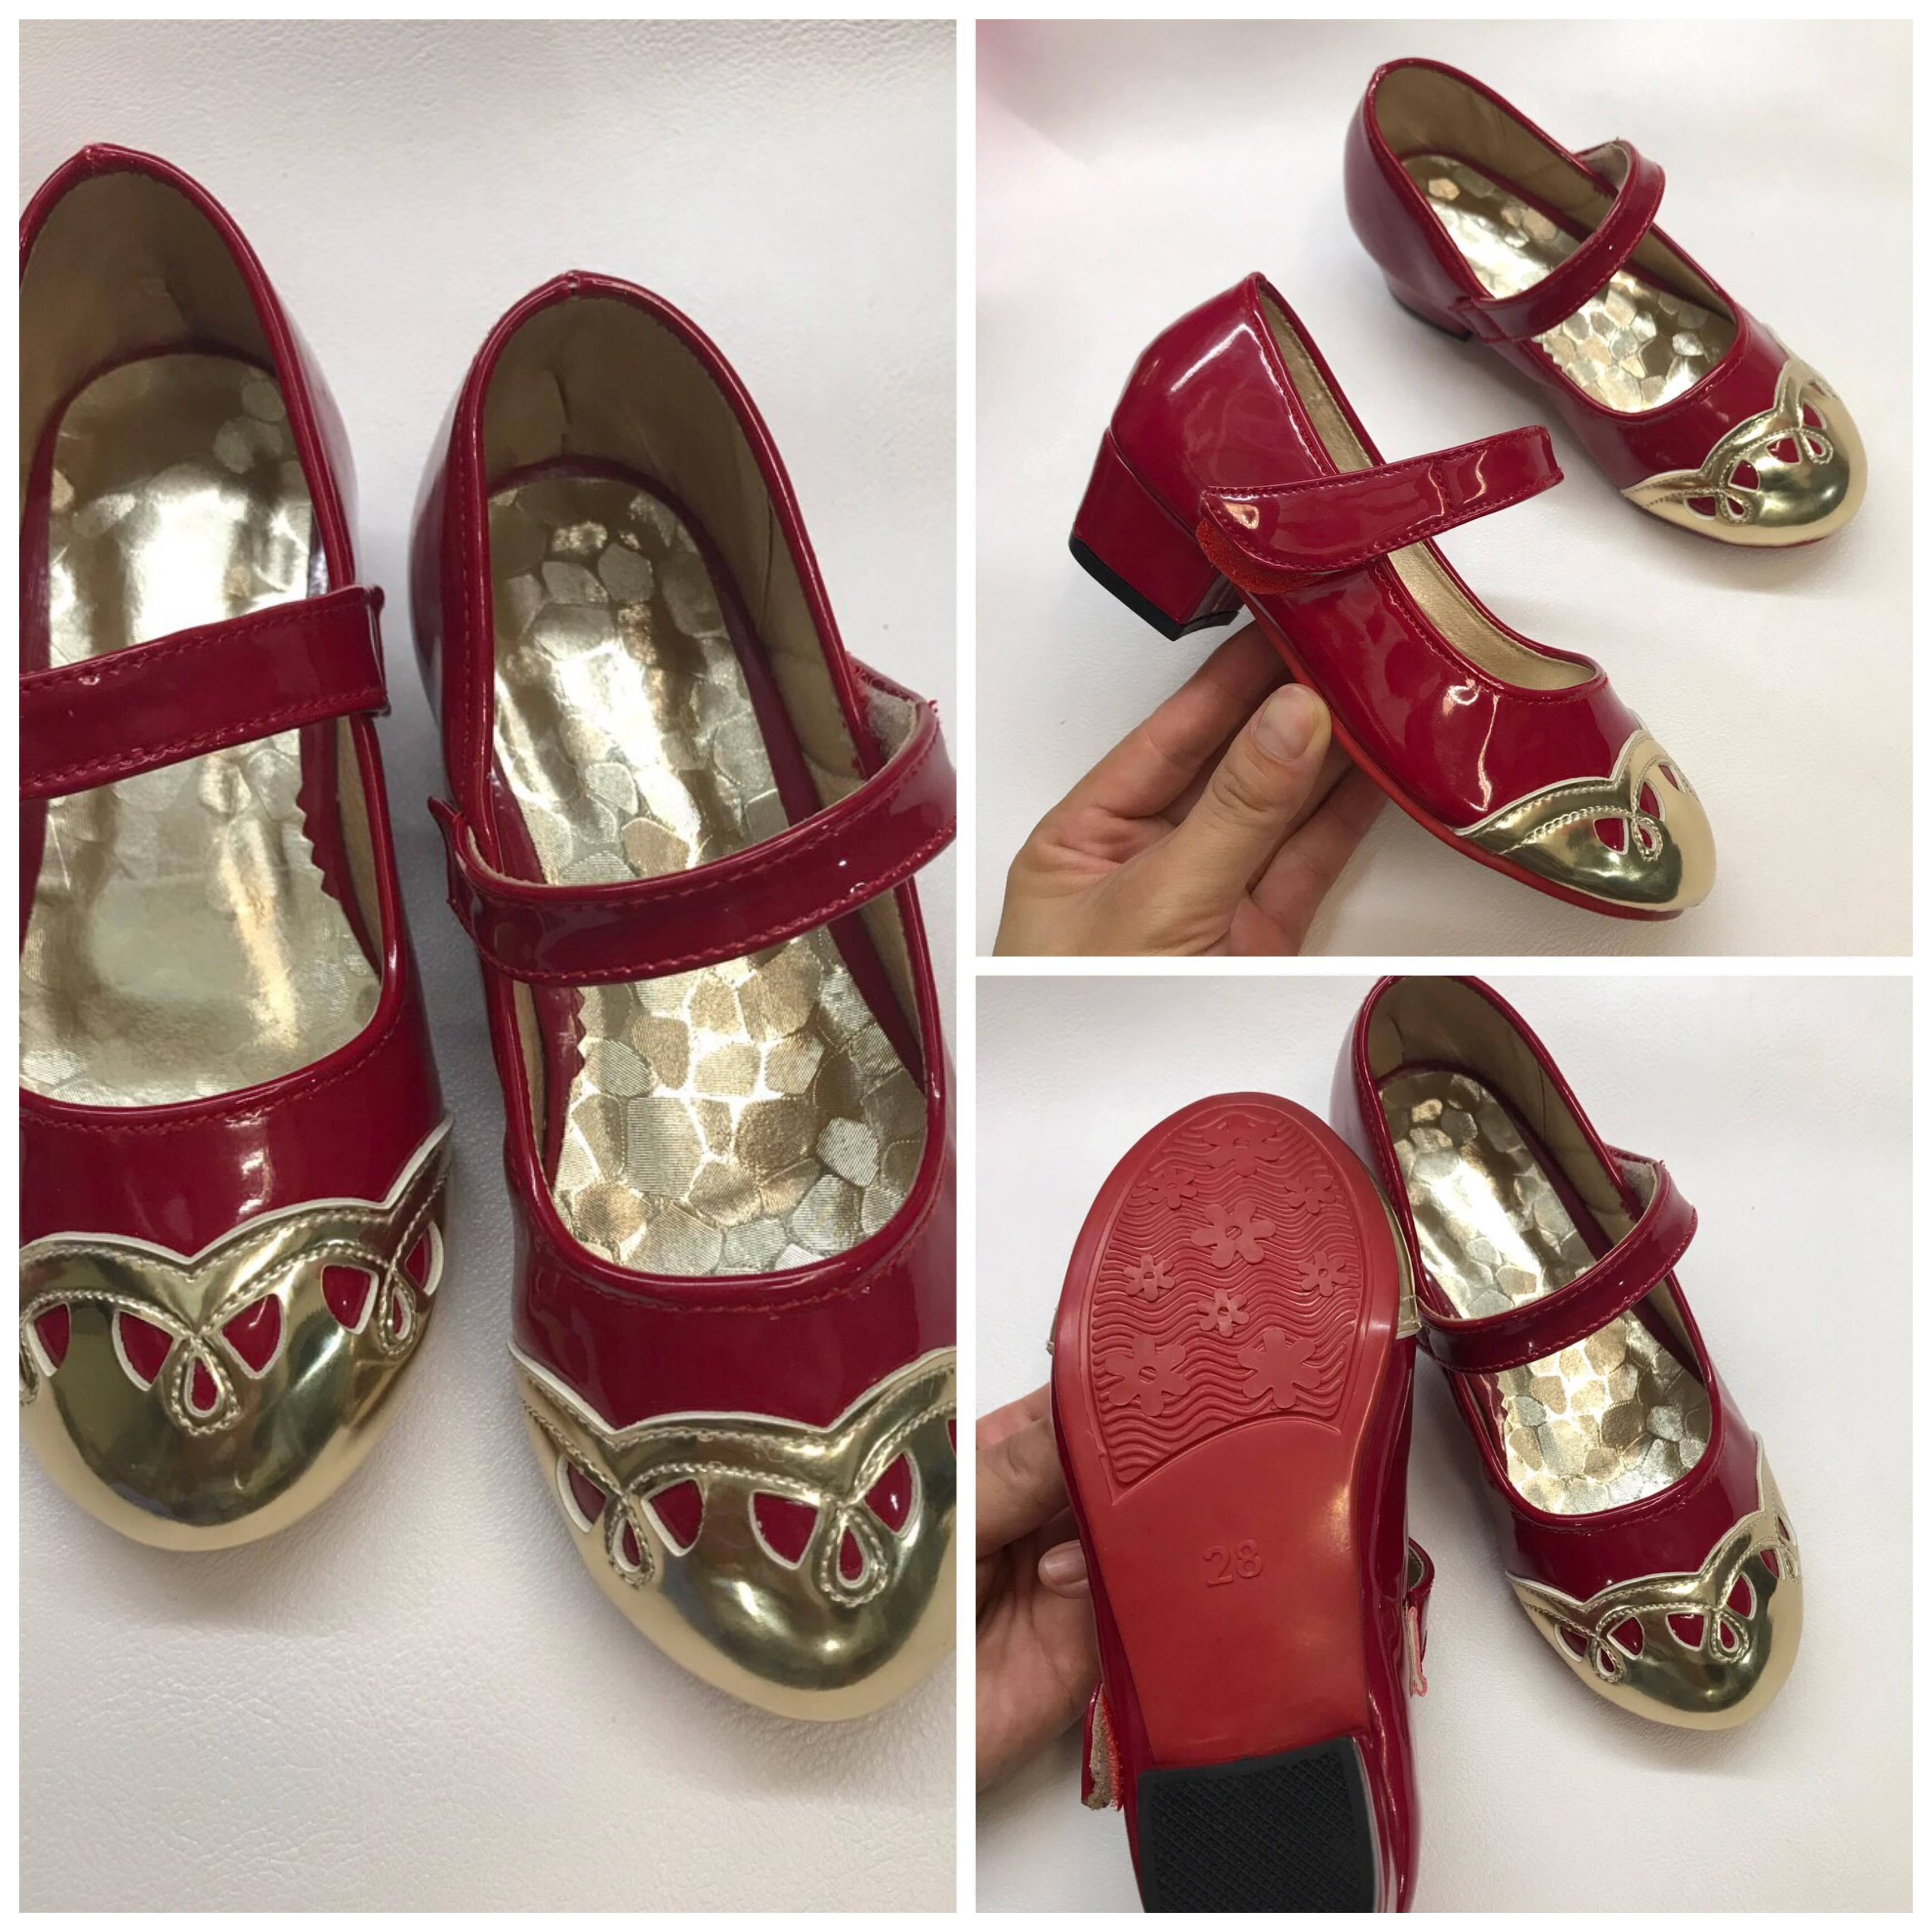 Giá bán Giày sandal cho bé gái cao gót 3cm sz25-34